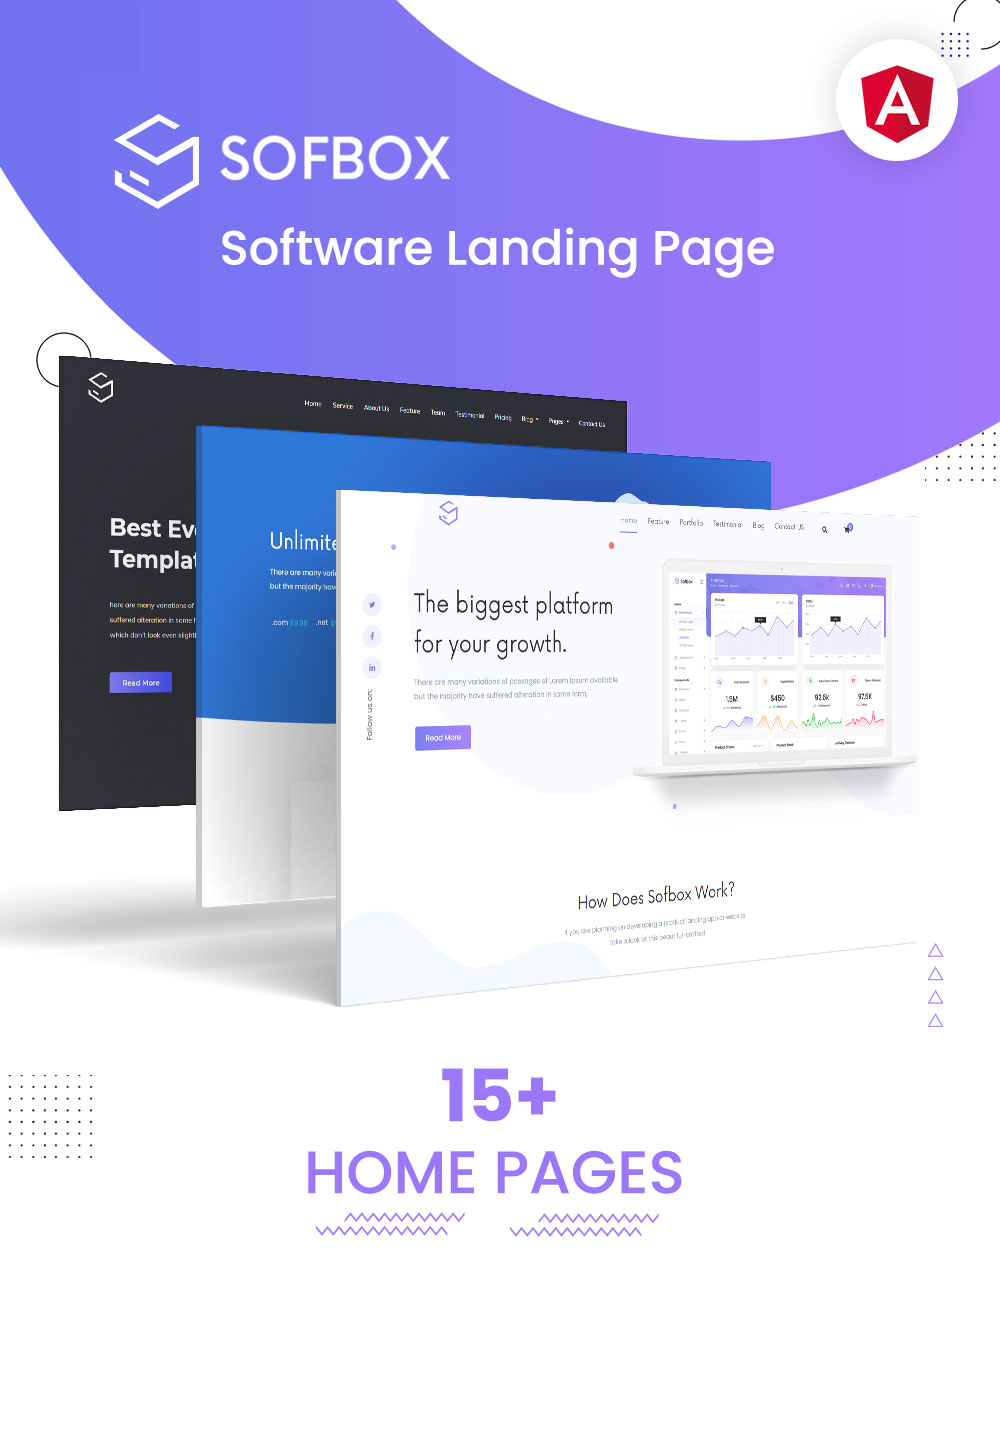 Sofbox - Angular 9 Software SaaS Landing Page - 1 angular 9 software saas landing page Sofbox angular